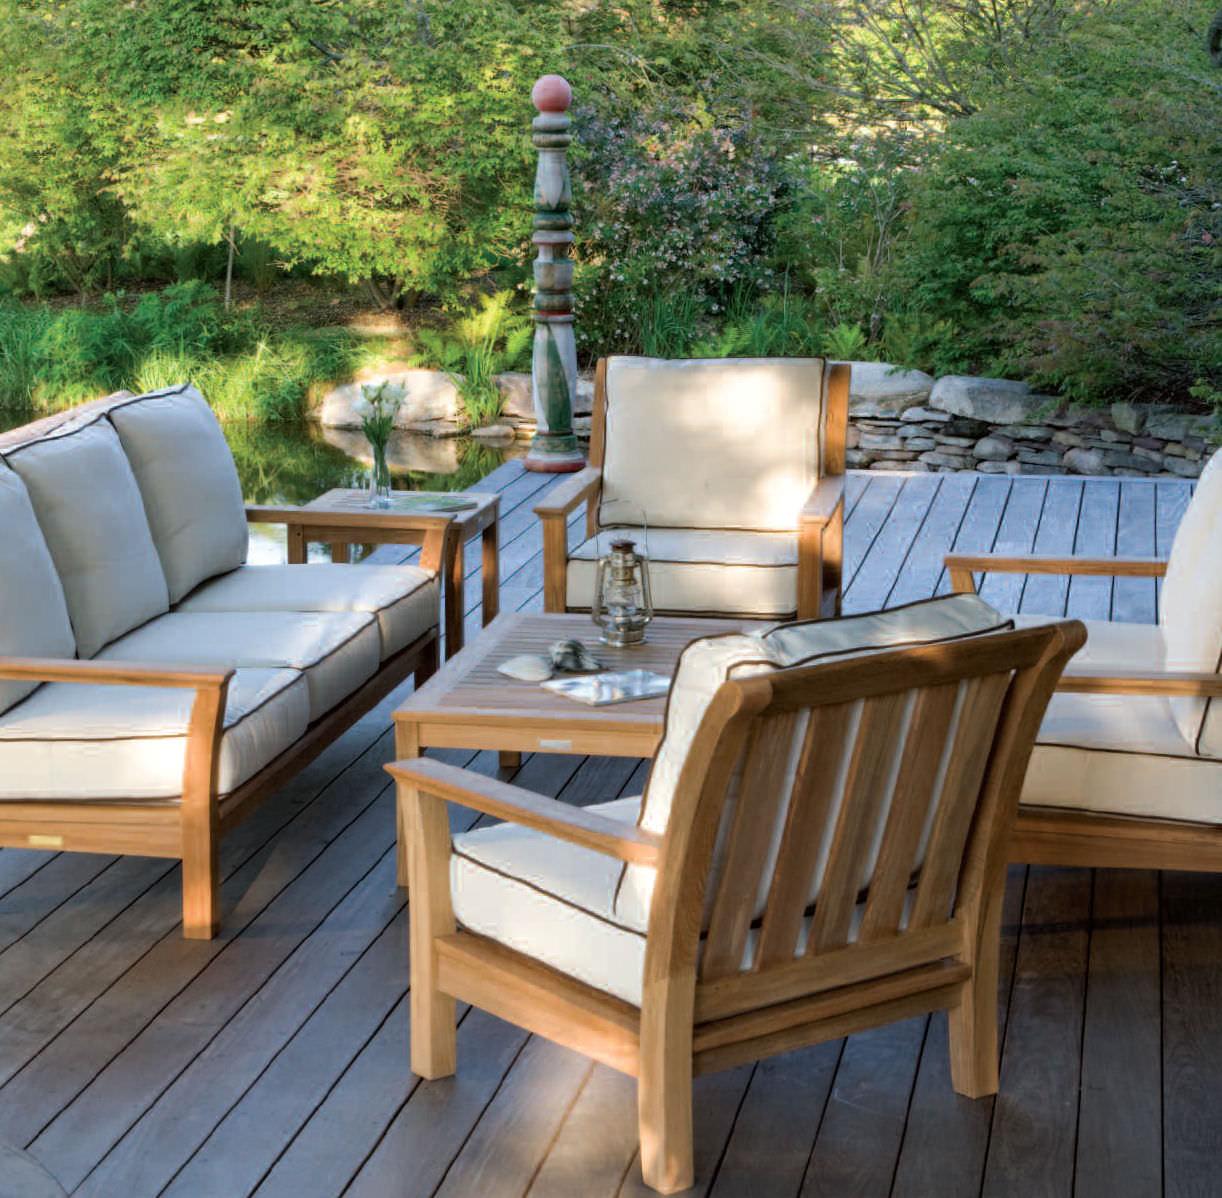 Sofá moderno / de jardín / madera / 3 plazas - CHELSEA - KINGSLEY-BATE